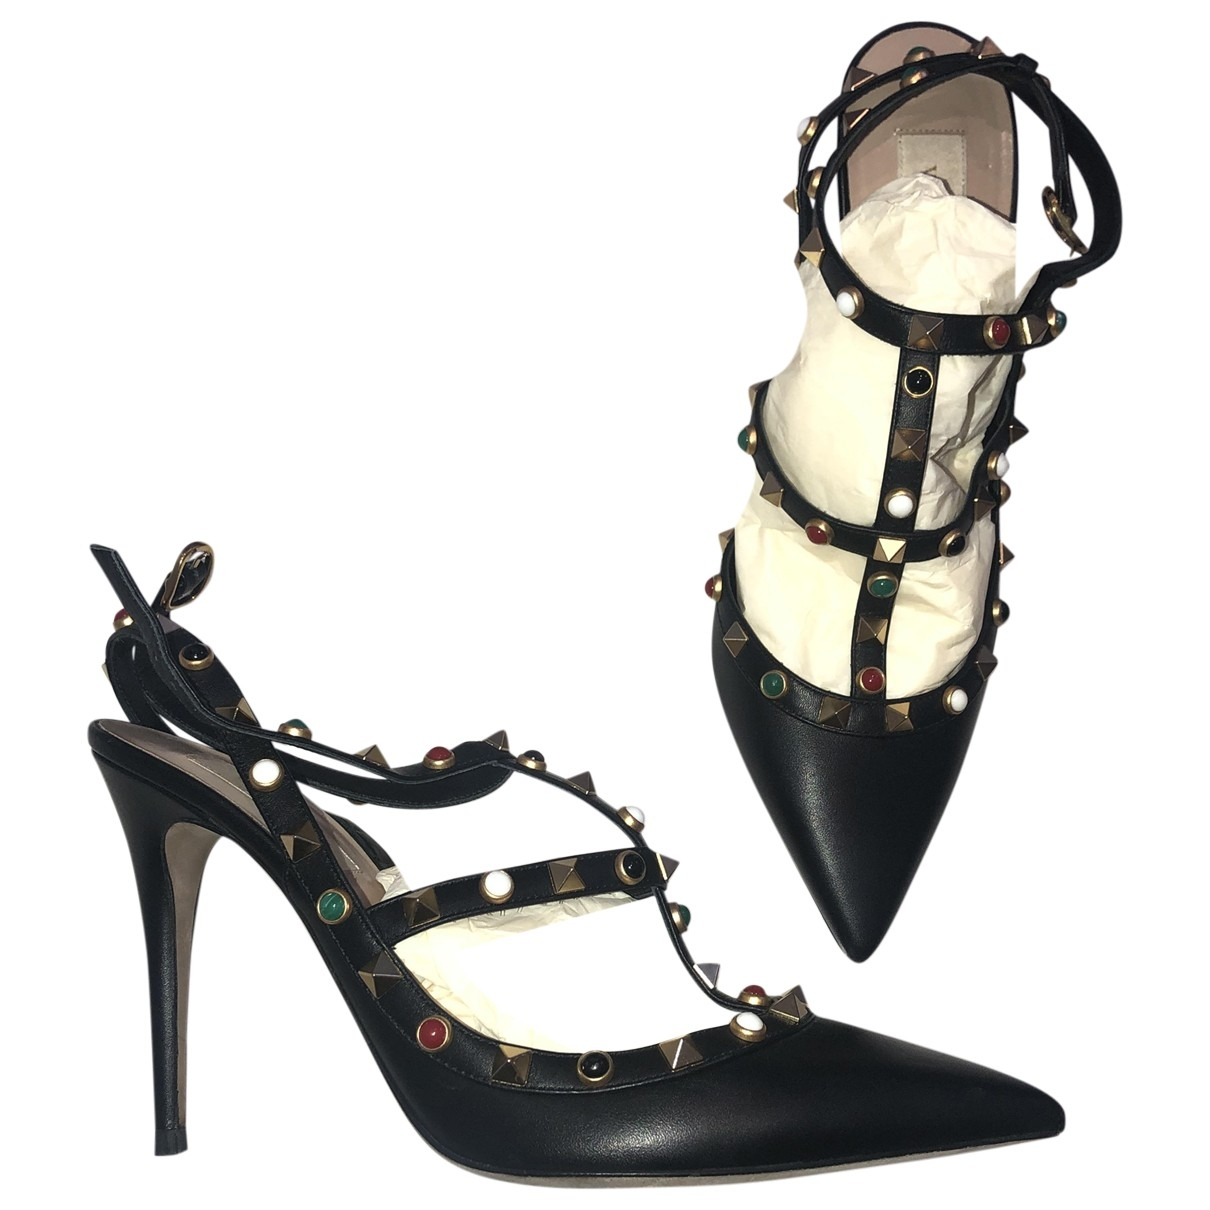 Valentino Garavani Rockstud Black Leather Heels for Women 40 EU